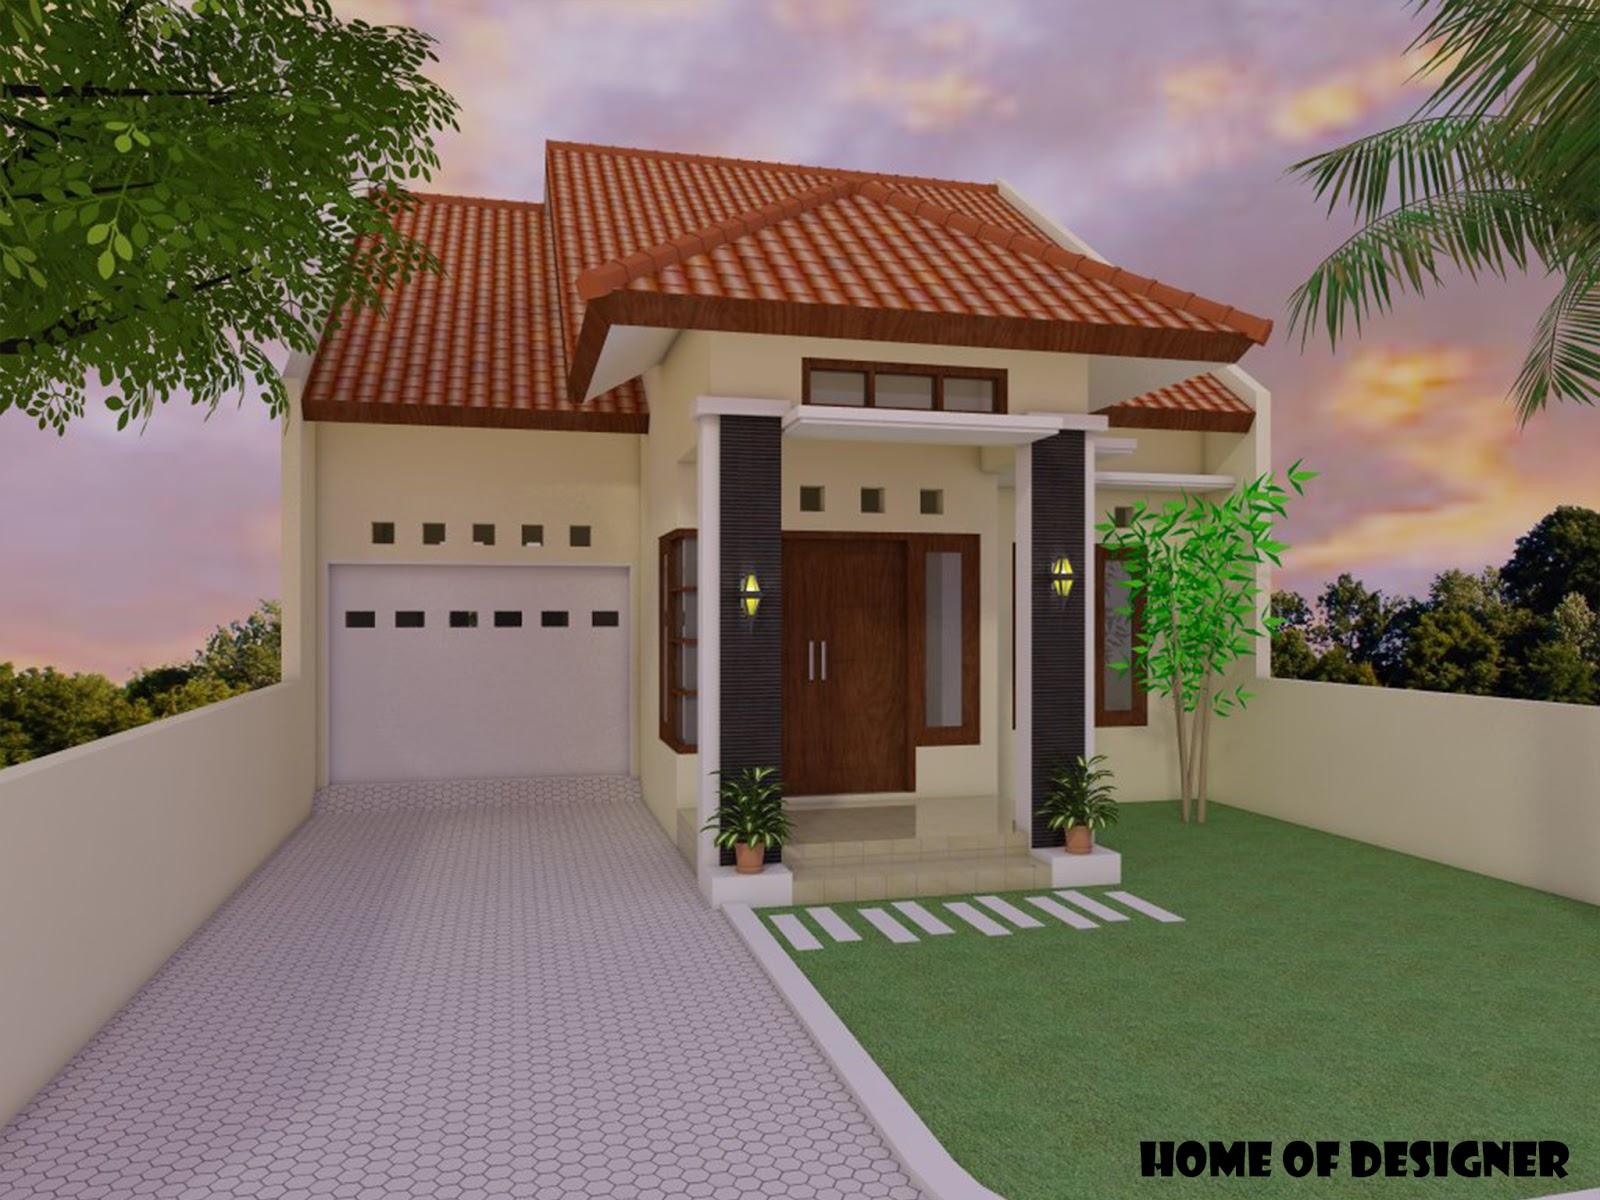 Rumah Desainer & Rumah Desainer: Jasa Desain Rumah 2D/3D Yogyakarta